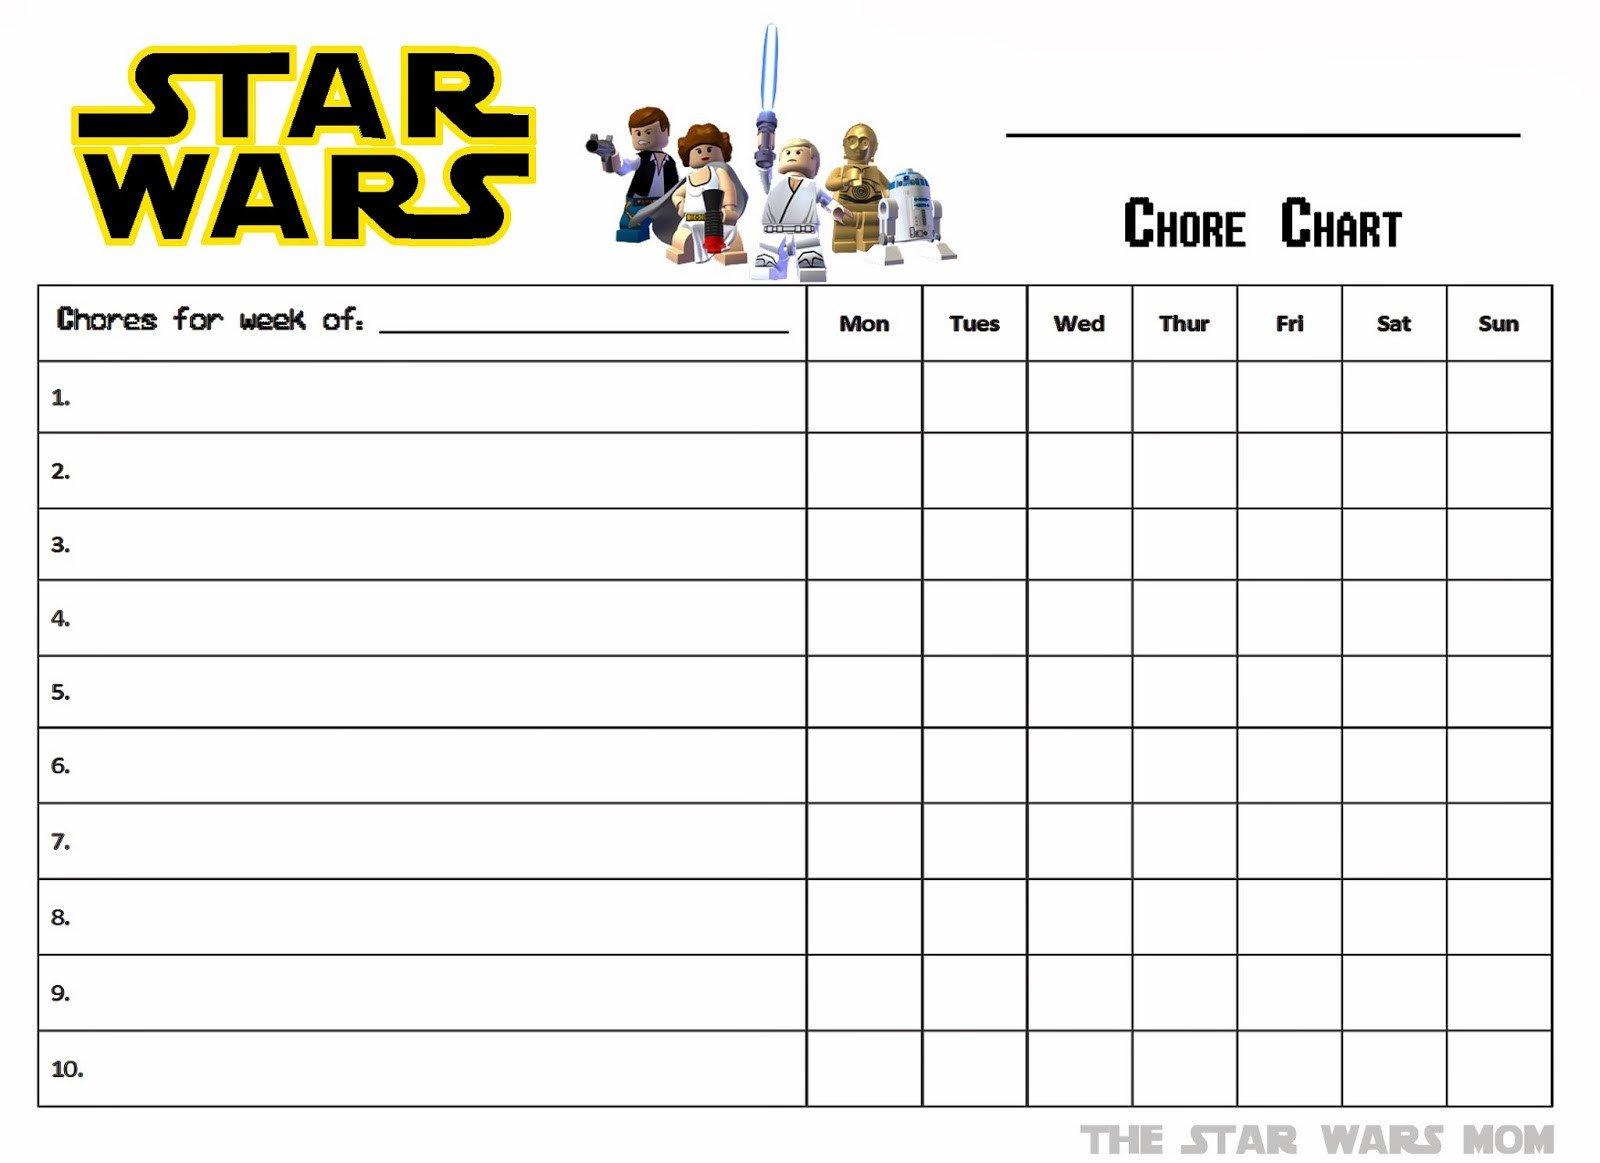 Chore Chart Templates Free Lego Star Wars Free Printable Chores Chart the Star